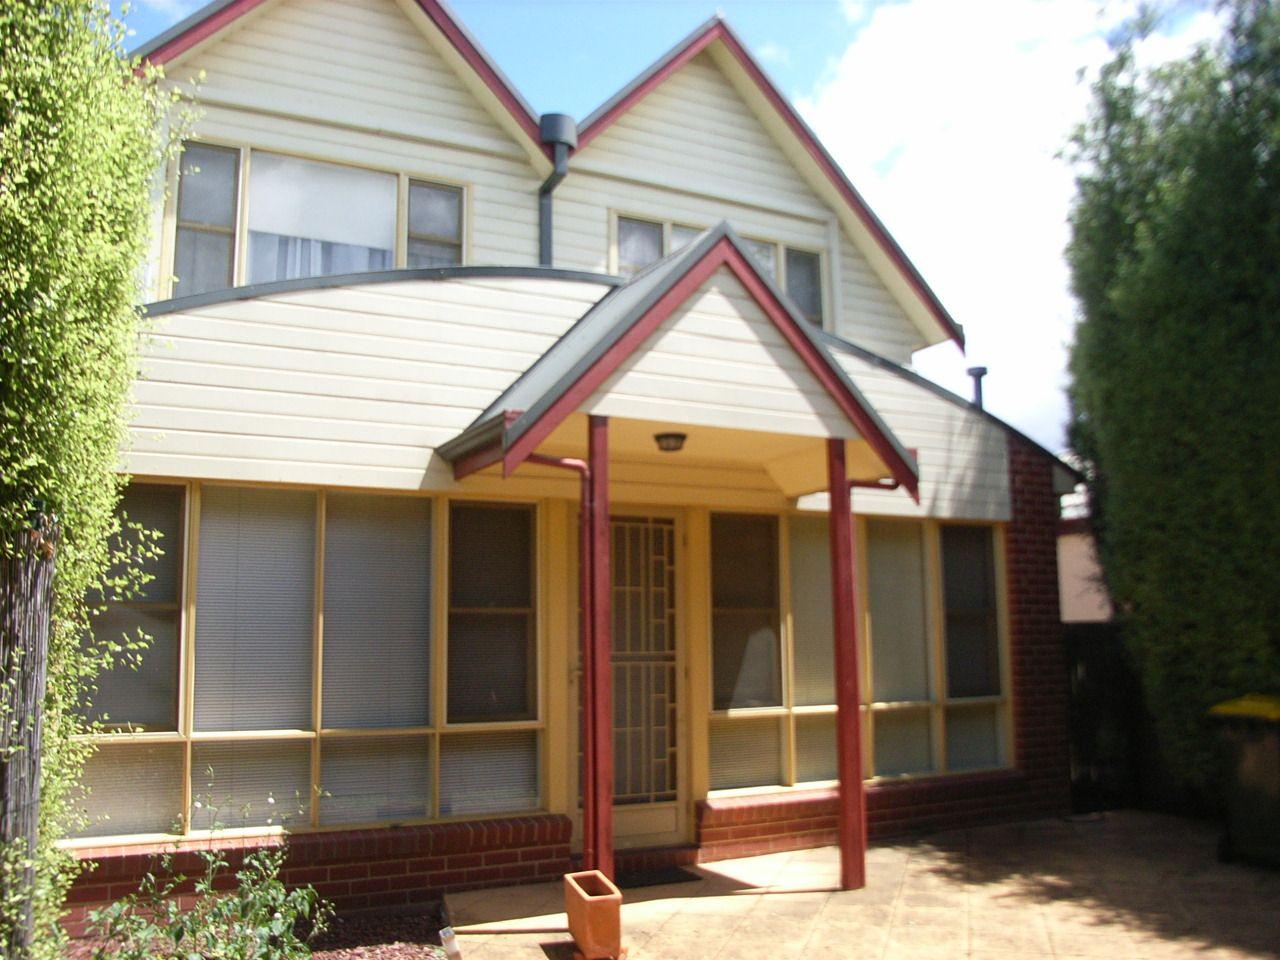 4/250 Malop Street, Geelong VIC 3220, Image 0